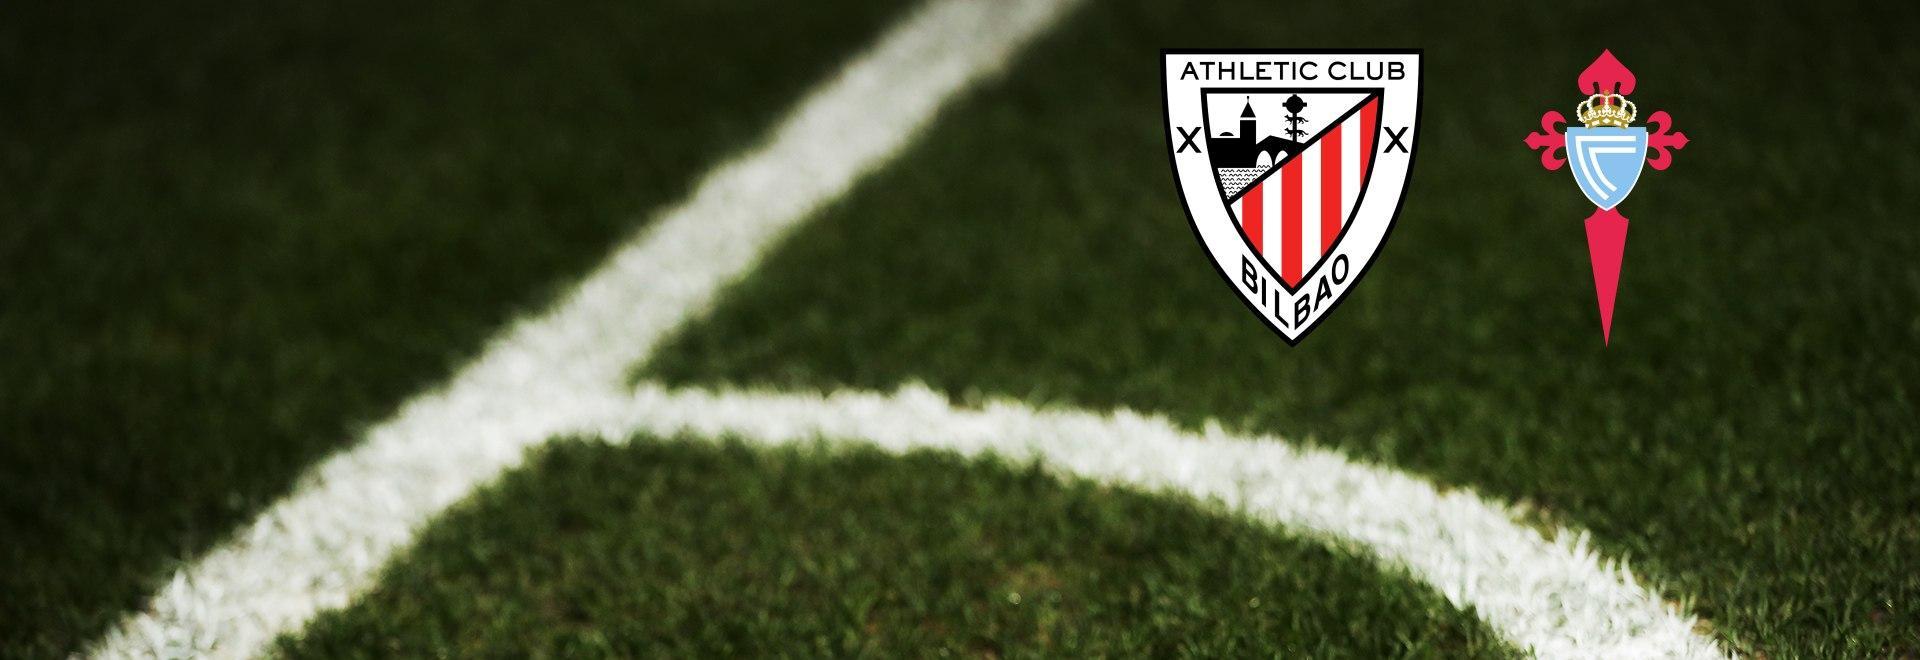 Athletic Club - Celta de Vigo. 12a g.